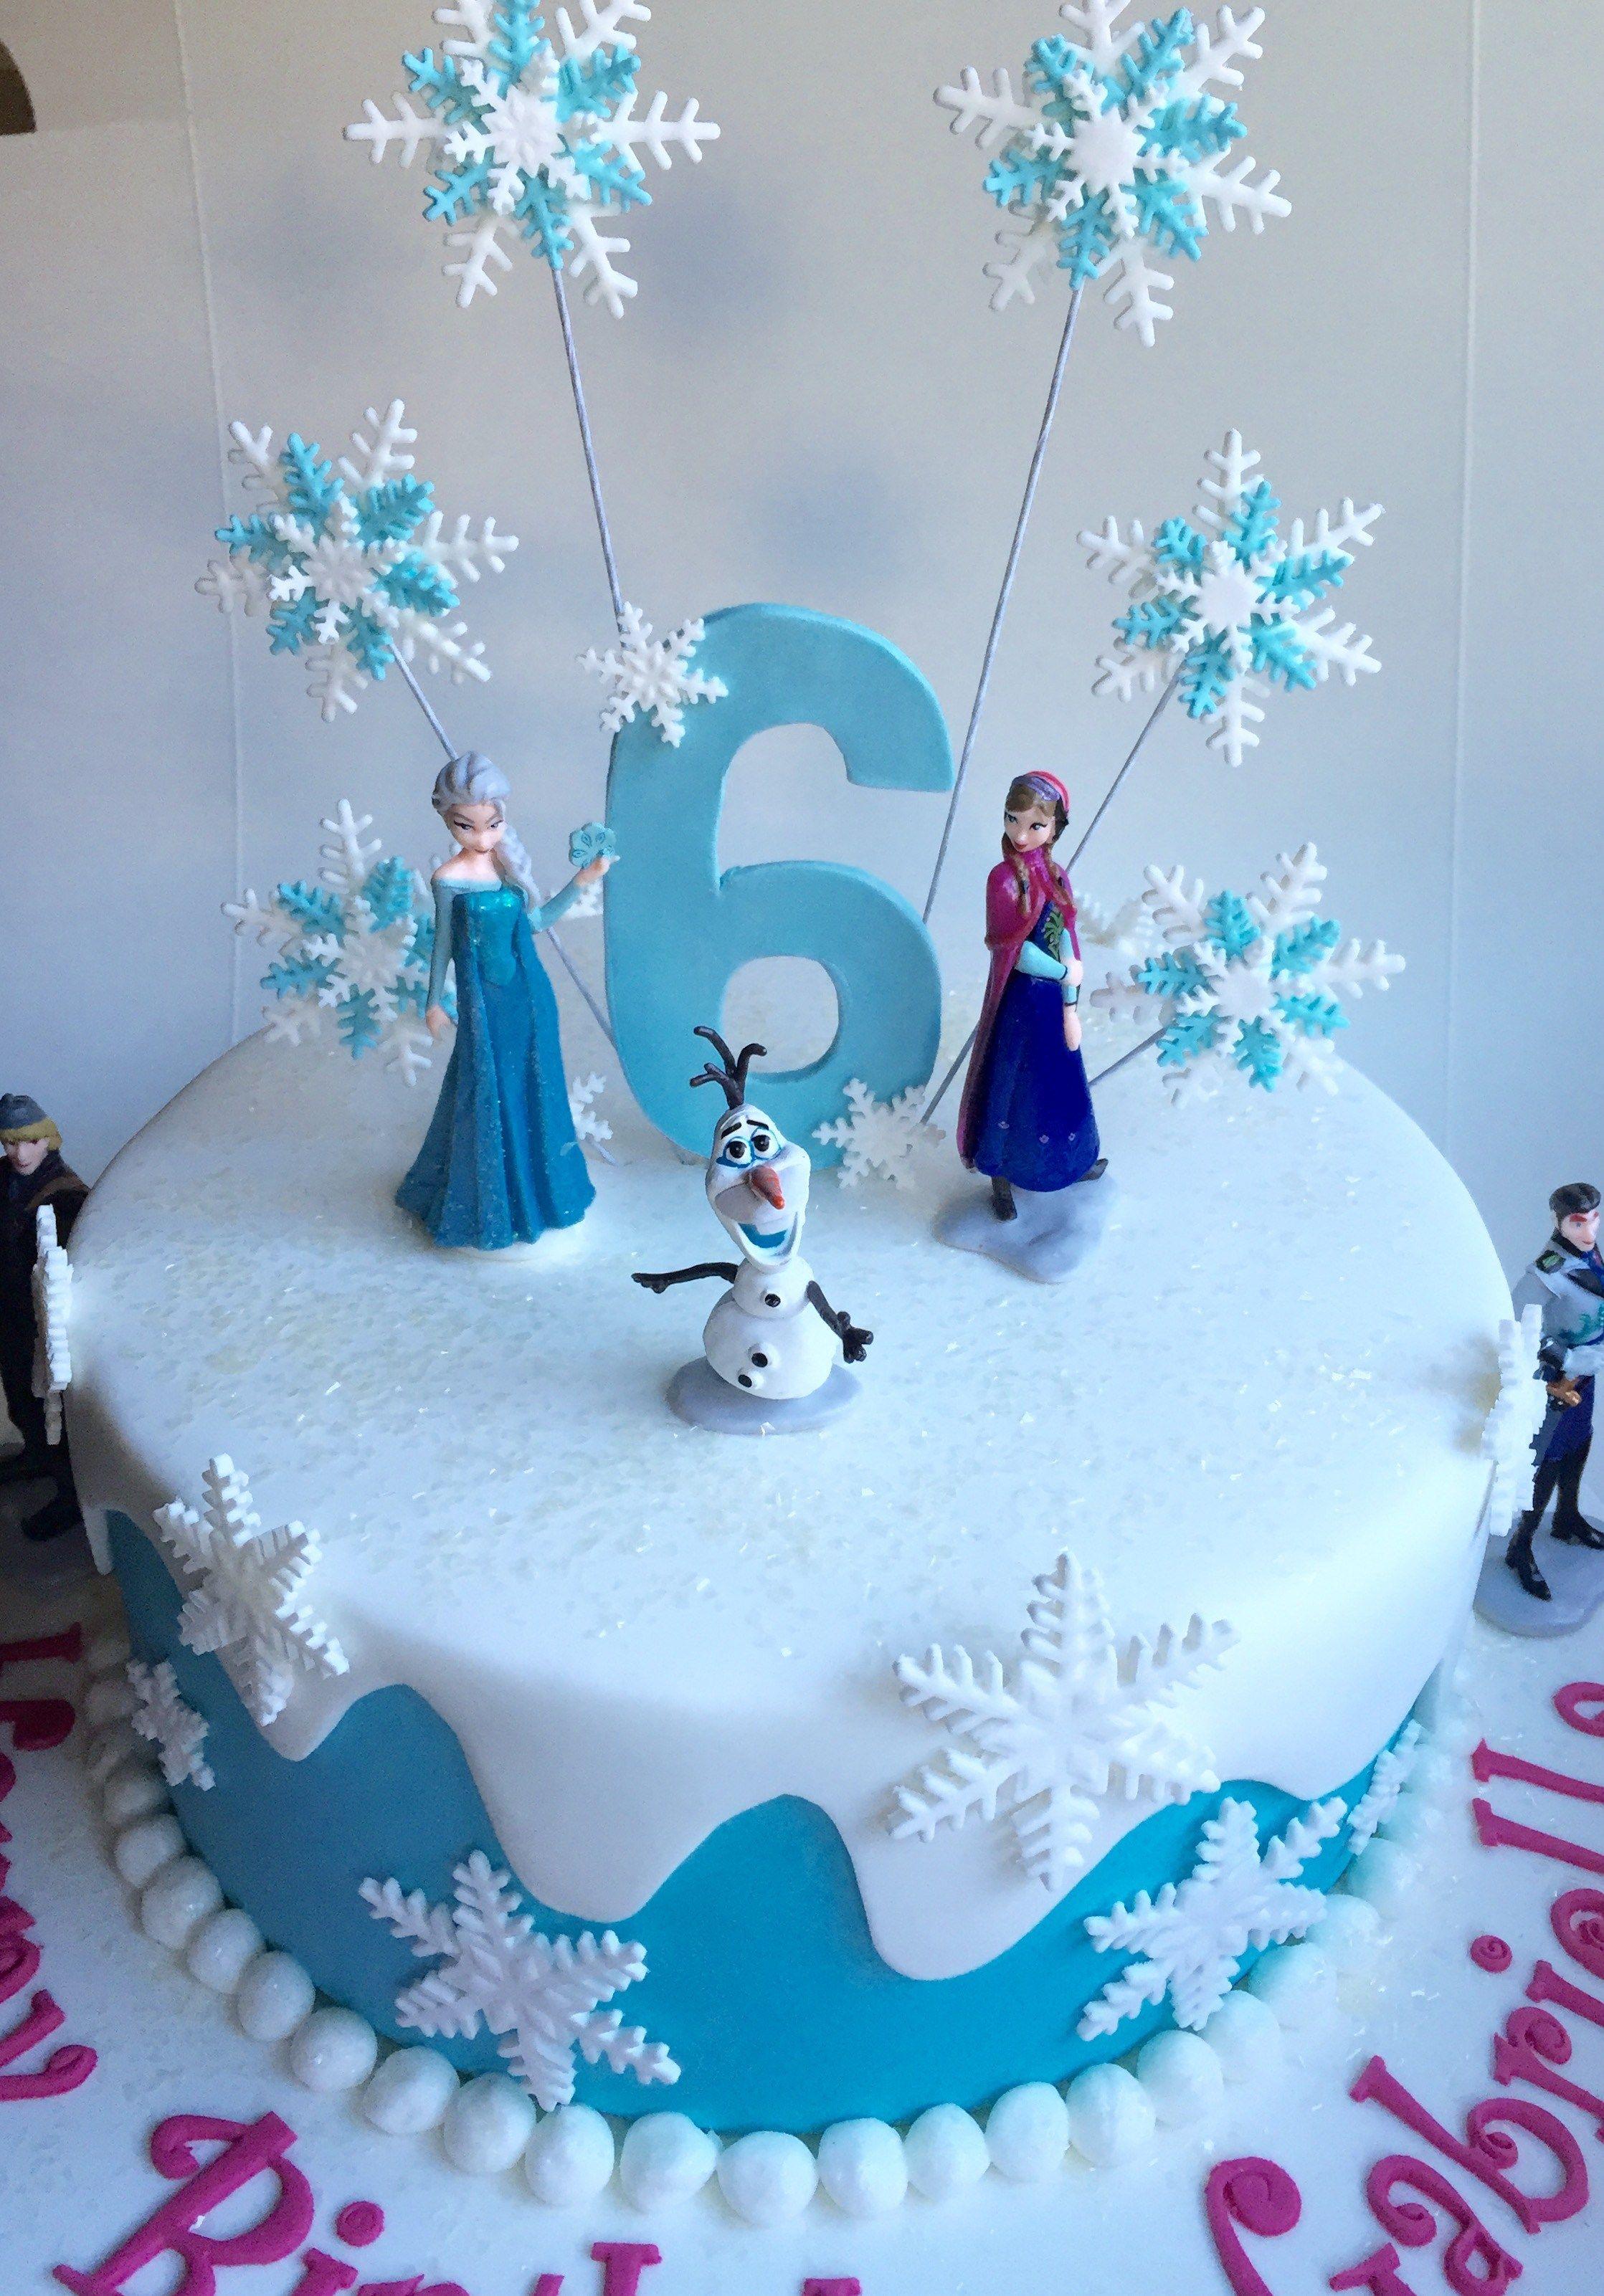 Stupendous 32 Elegant Image Of Frozen Birthday Cake Ideas Frozen Themed Funny Birthday Cards Online Alyptdamsfinfo